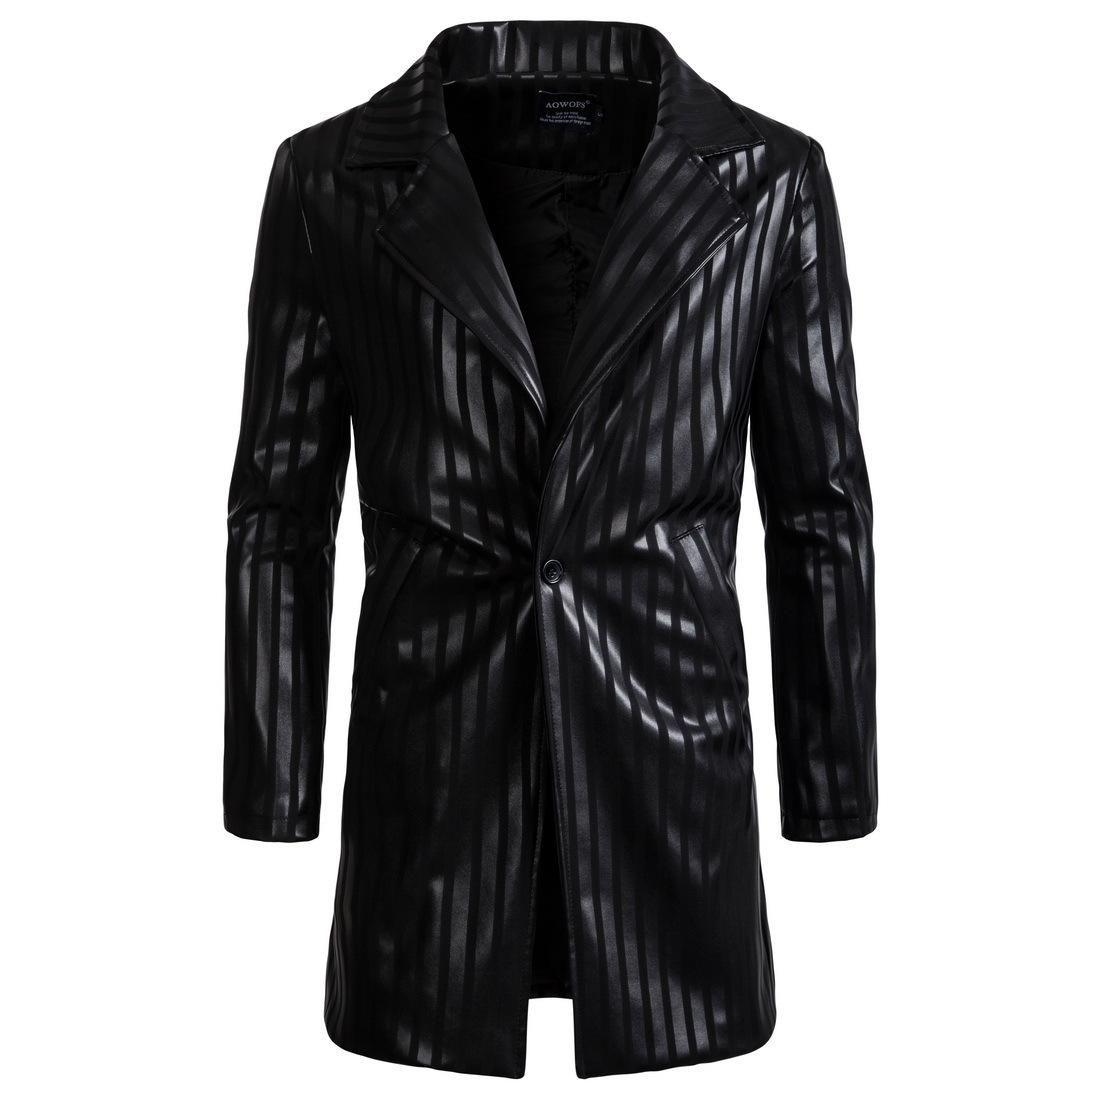 Winter PU Leather Jacket Men Long Leather Blazer Neck Jackets Coat Trench Overcoat Mens Striped Leather Jackets Coats S-2XL J180734